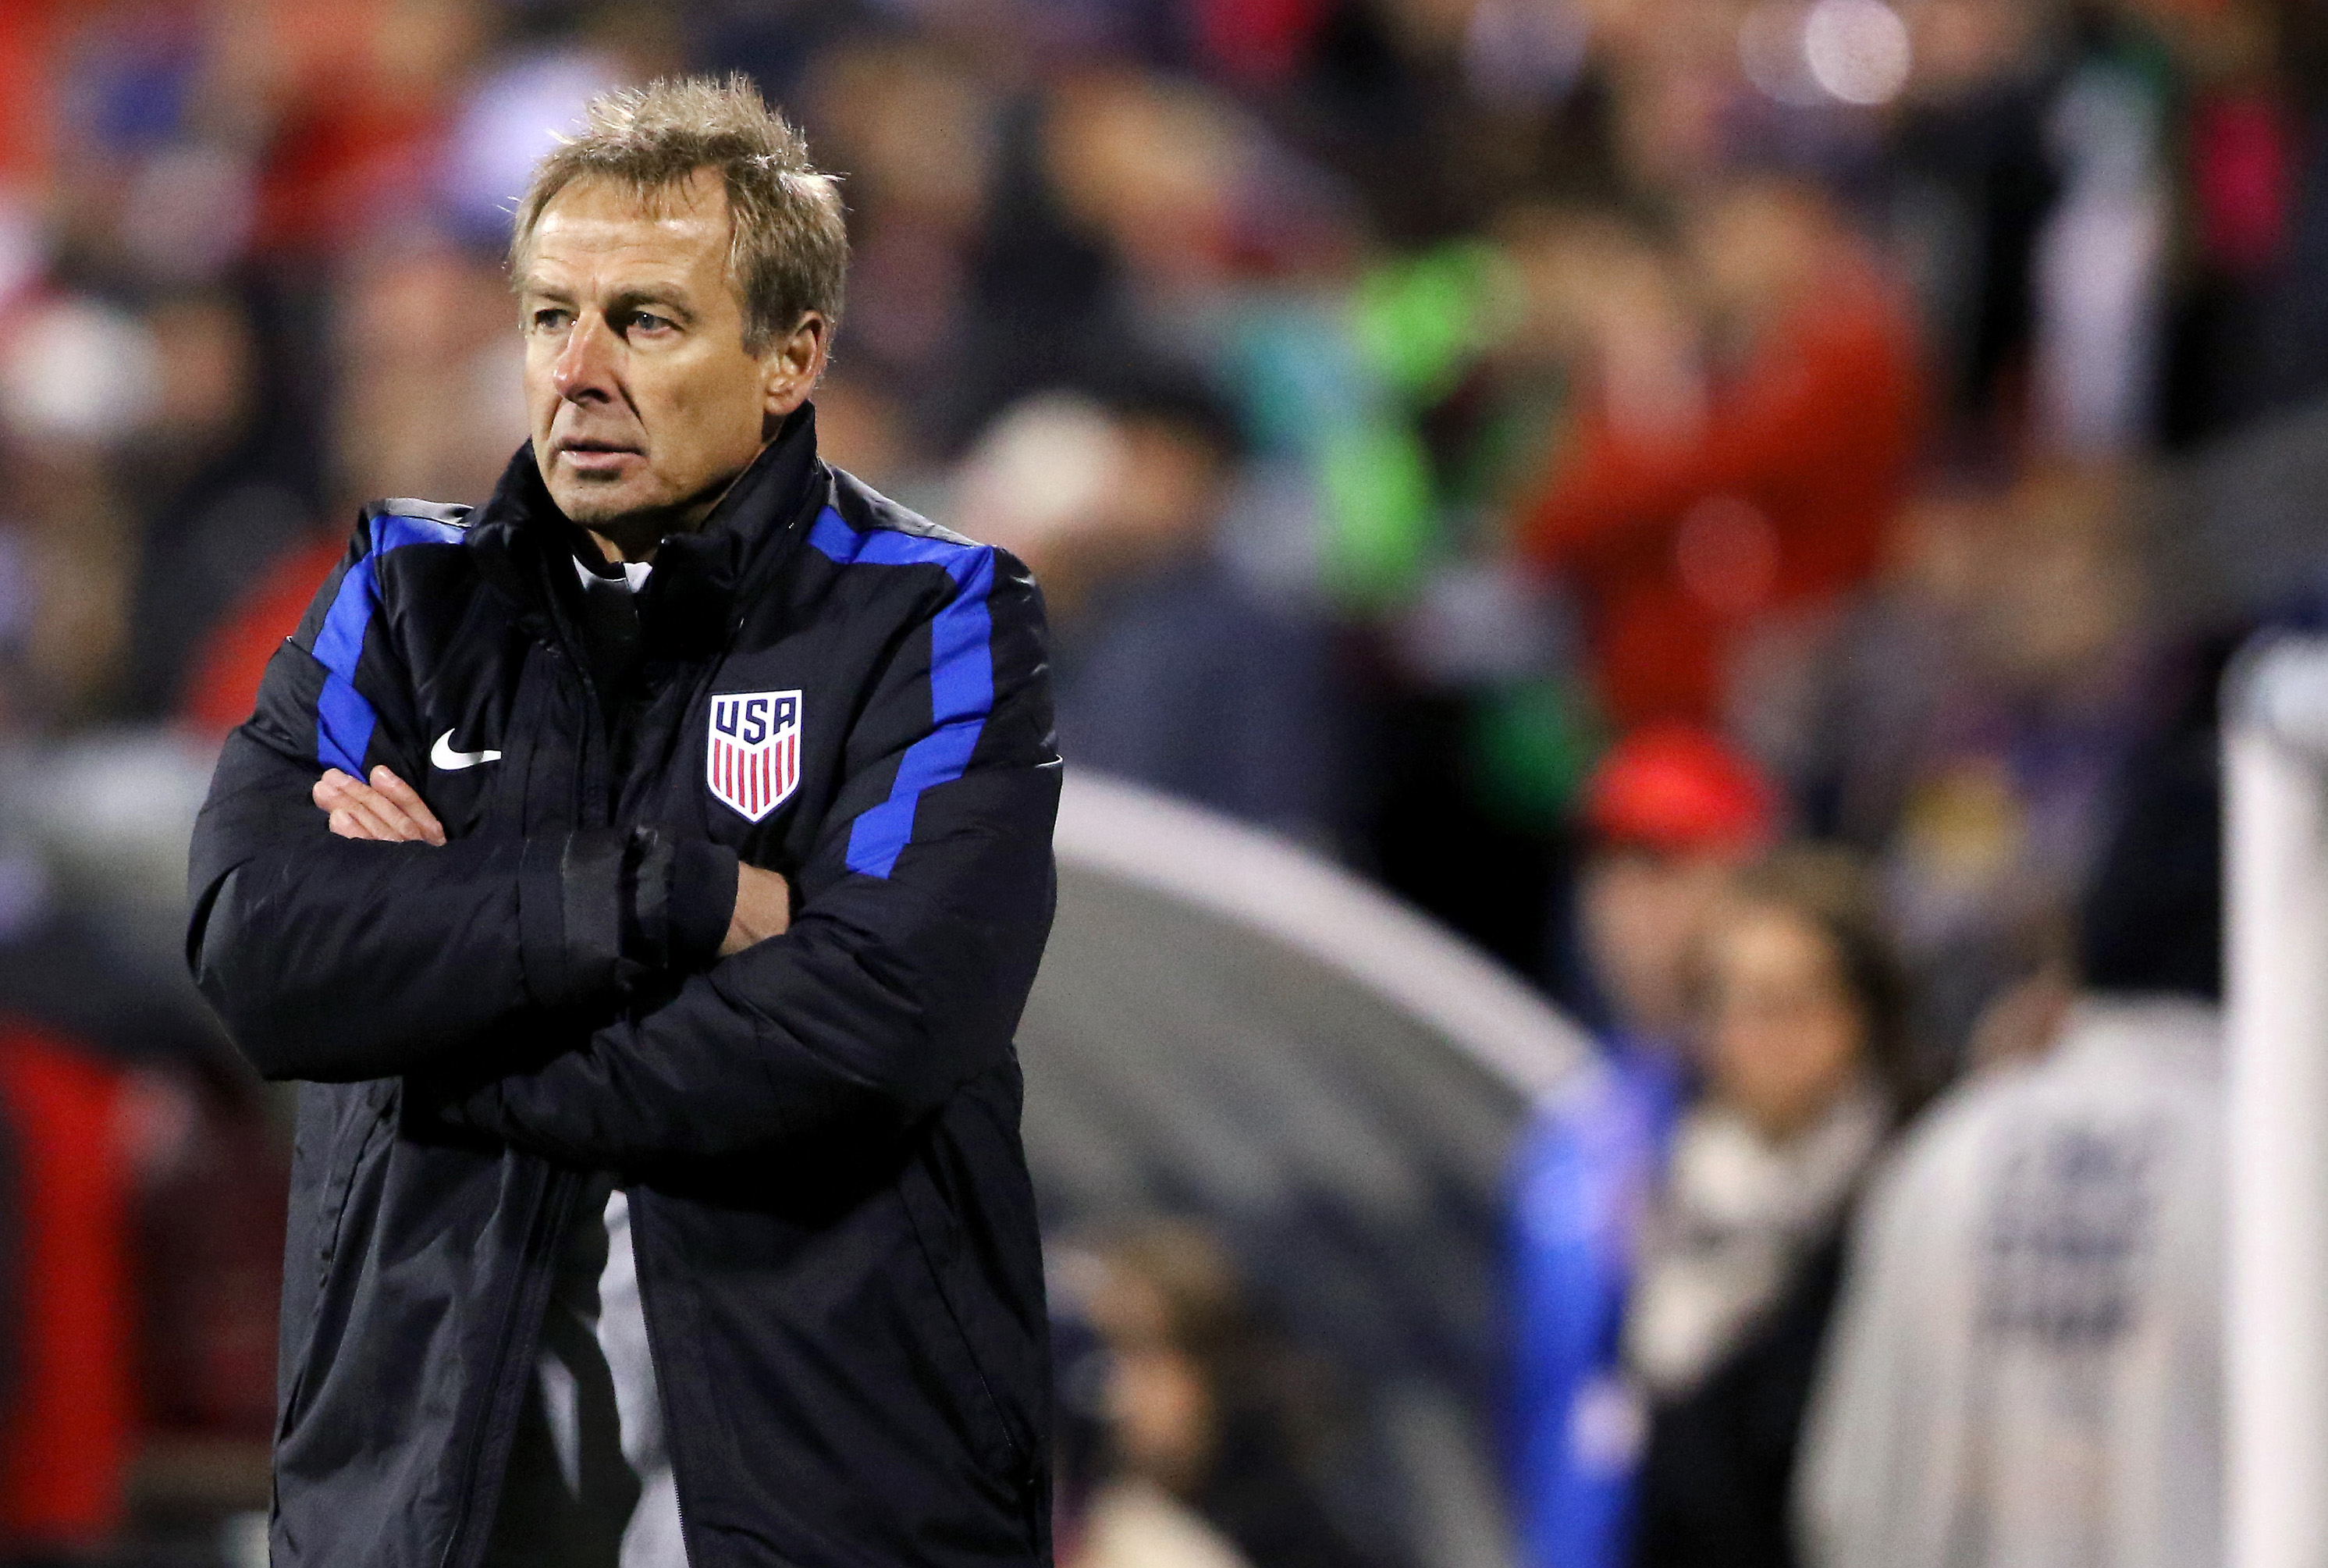 USA head coach Jurgen Klinsmann looks dismayed during the second half against Mexico .